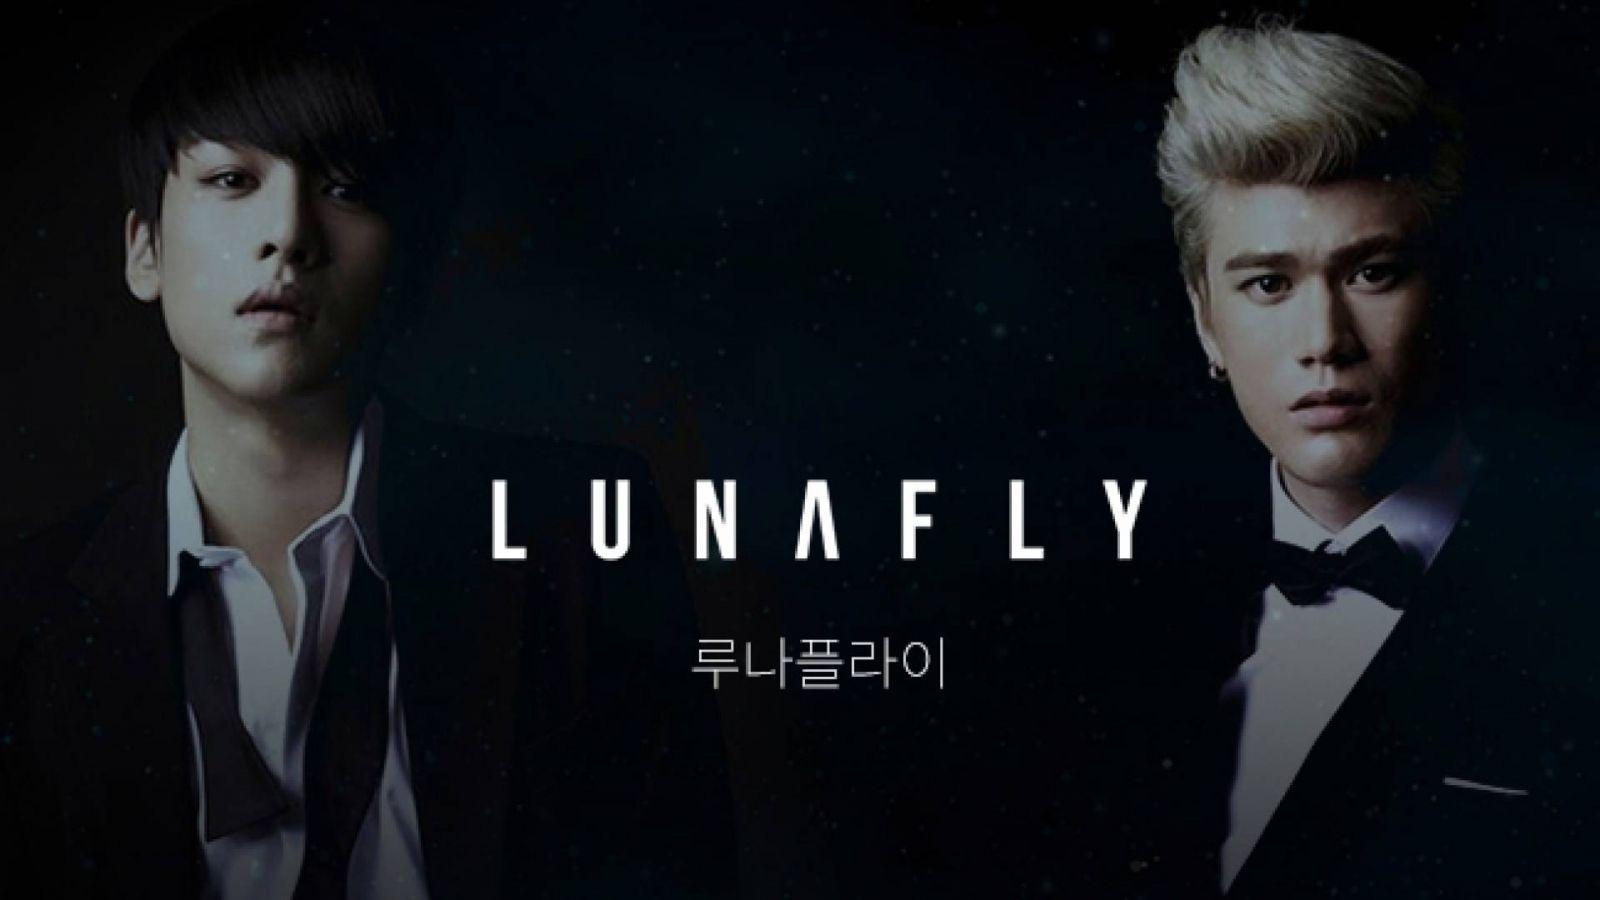 LUNAFLY julkaisi uuden kappaleen © Lunafly. All Rights Reserved.